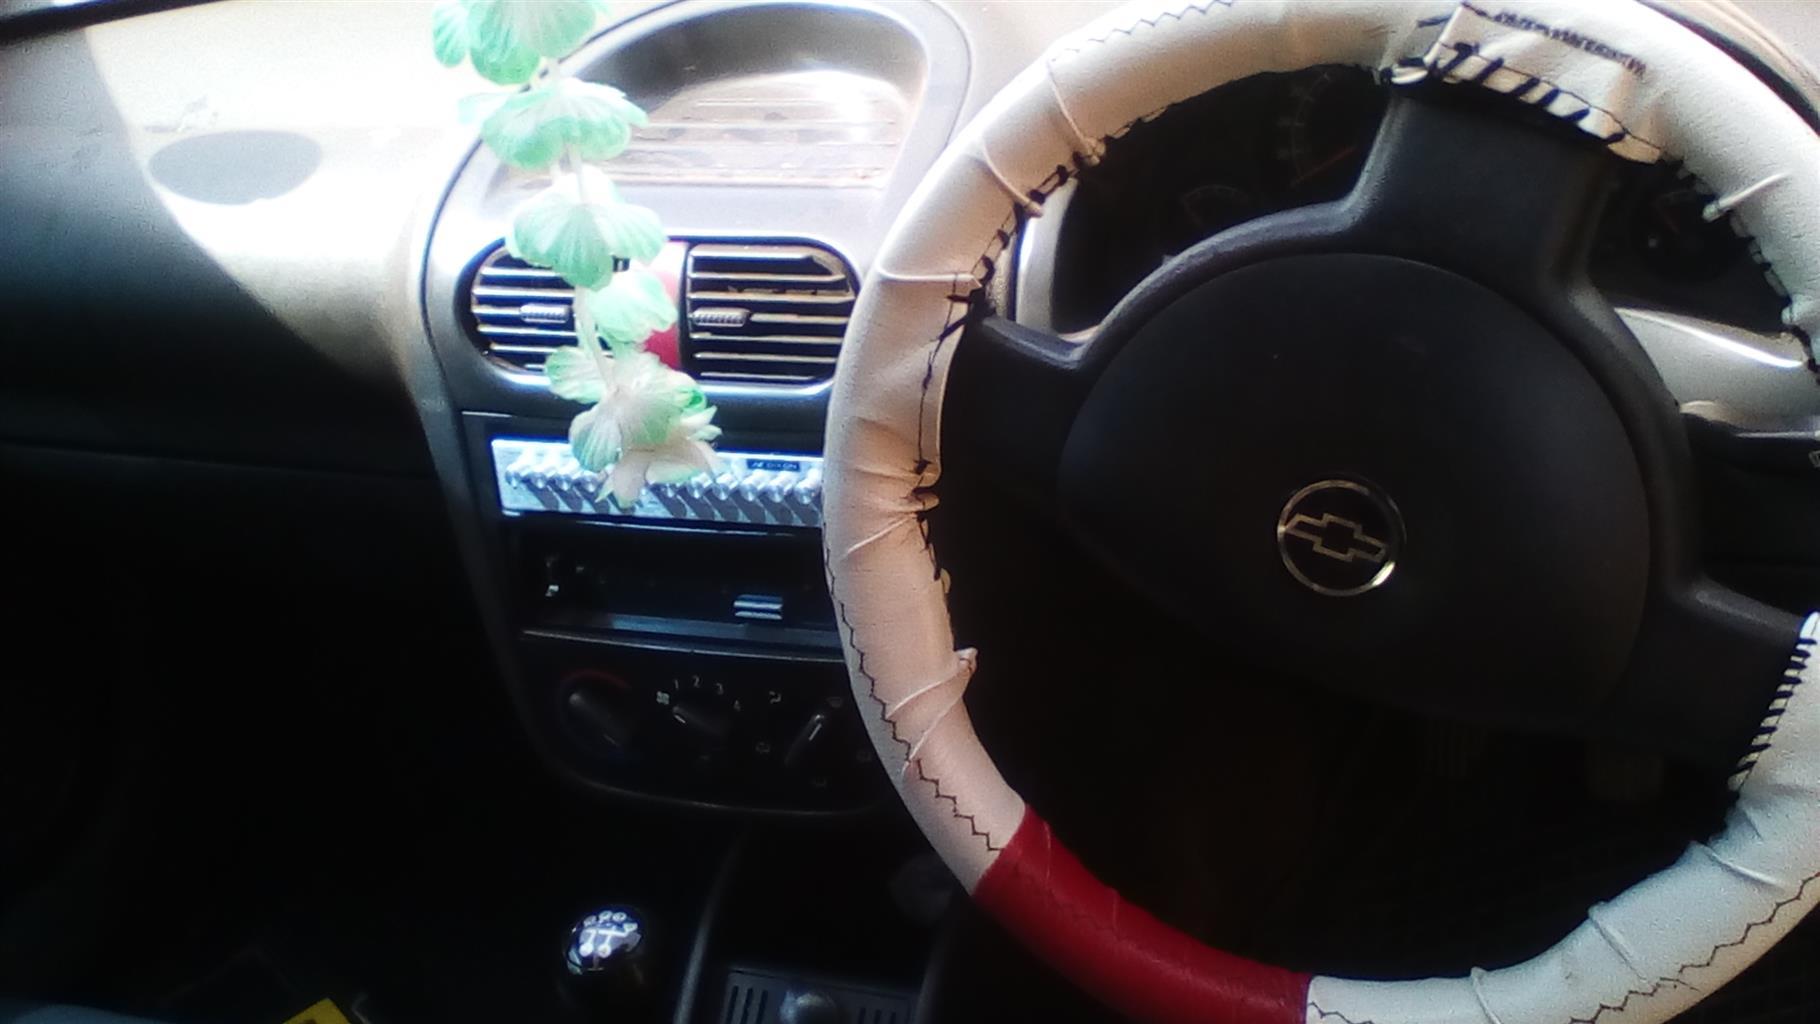 2010 Chevrolet Corsa Utility 1.4 Club